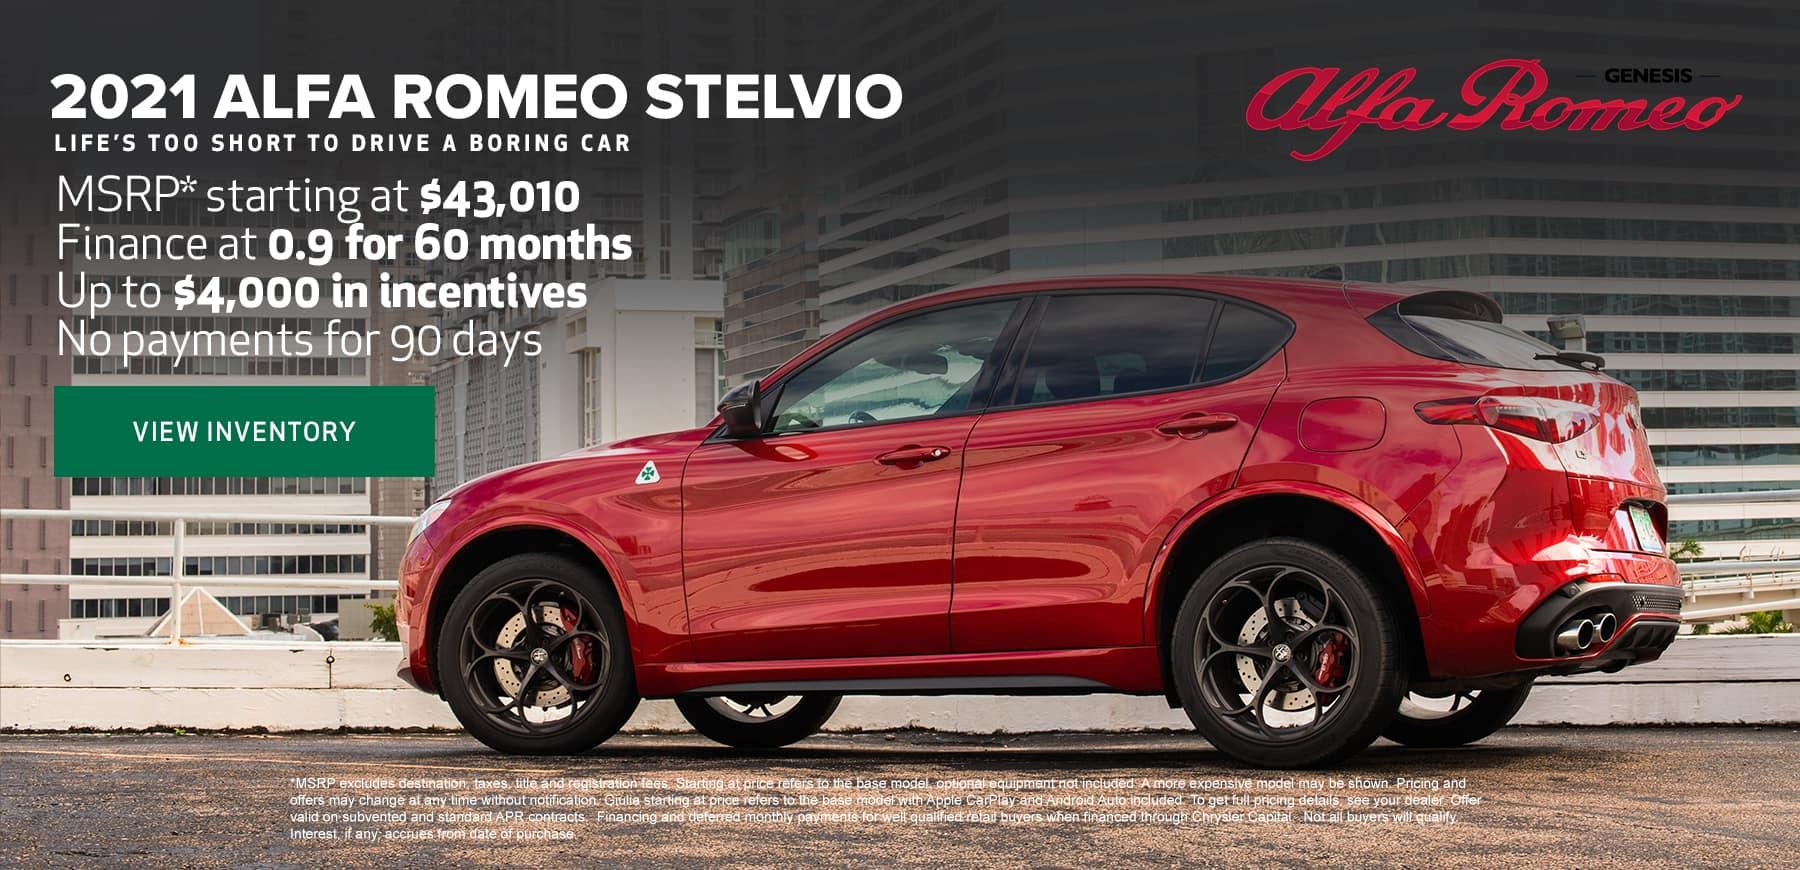 Genesis Alfa Romeo Stelvio Deals